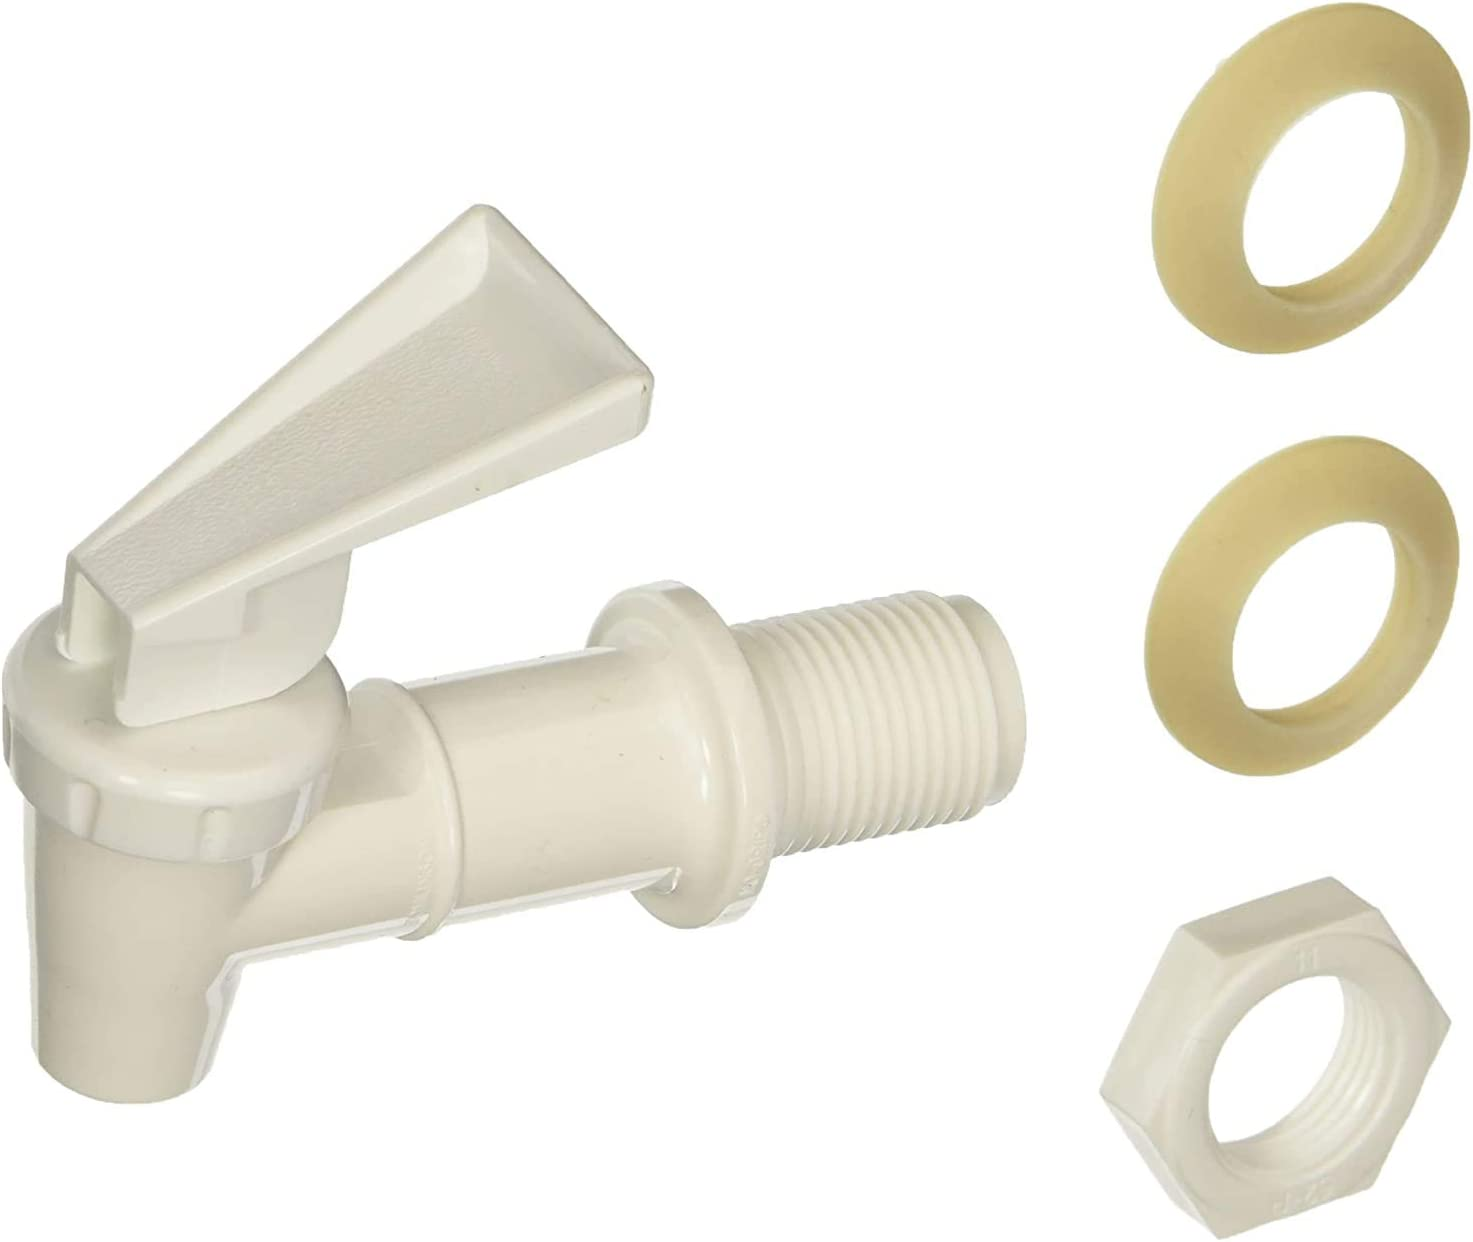 Cambro 46017 Replacement Faucet for Cambro DSPR6 6-Gallon Beverage Dispenser, White